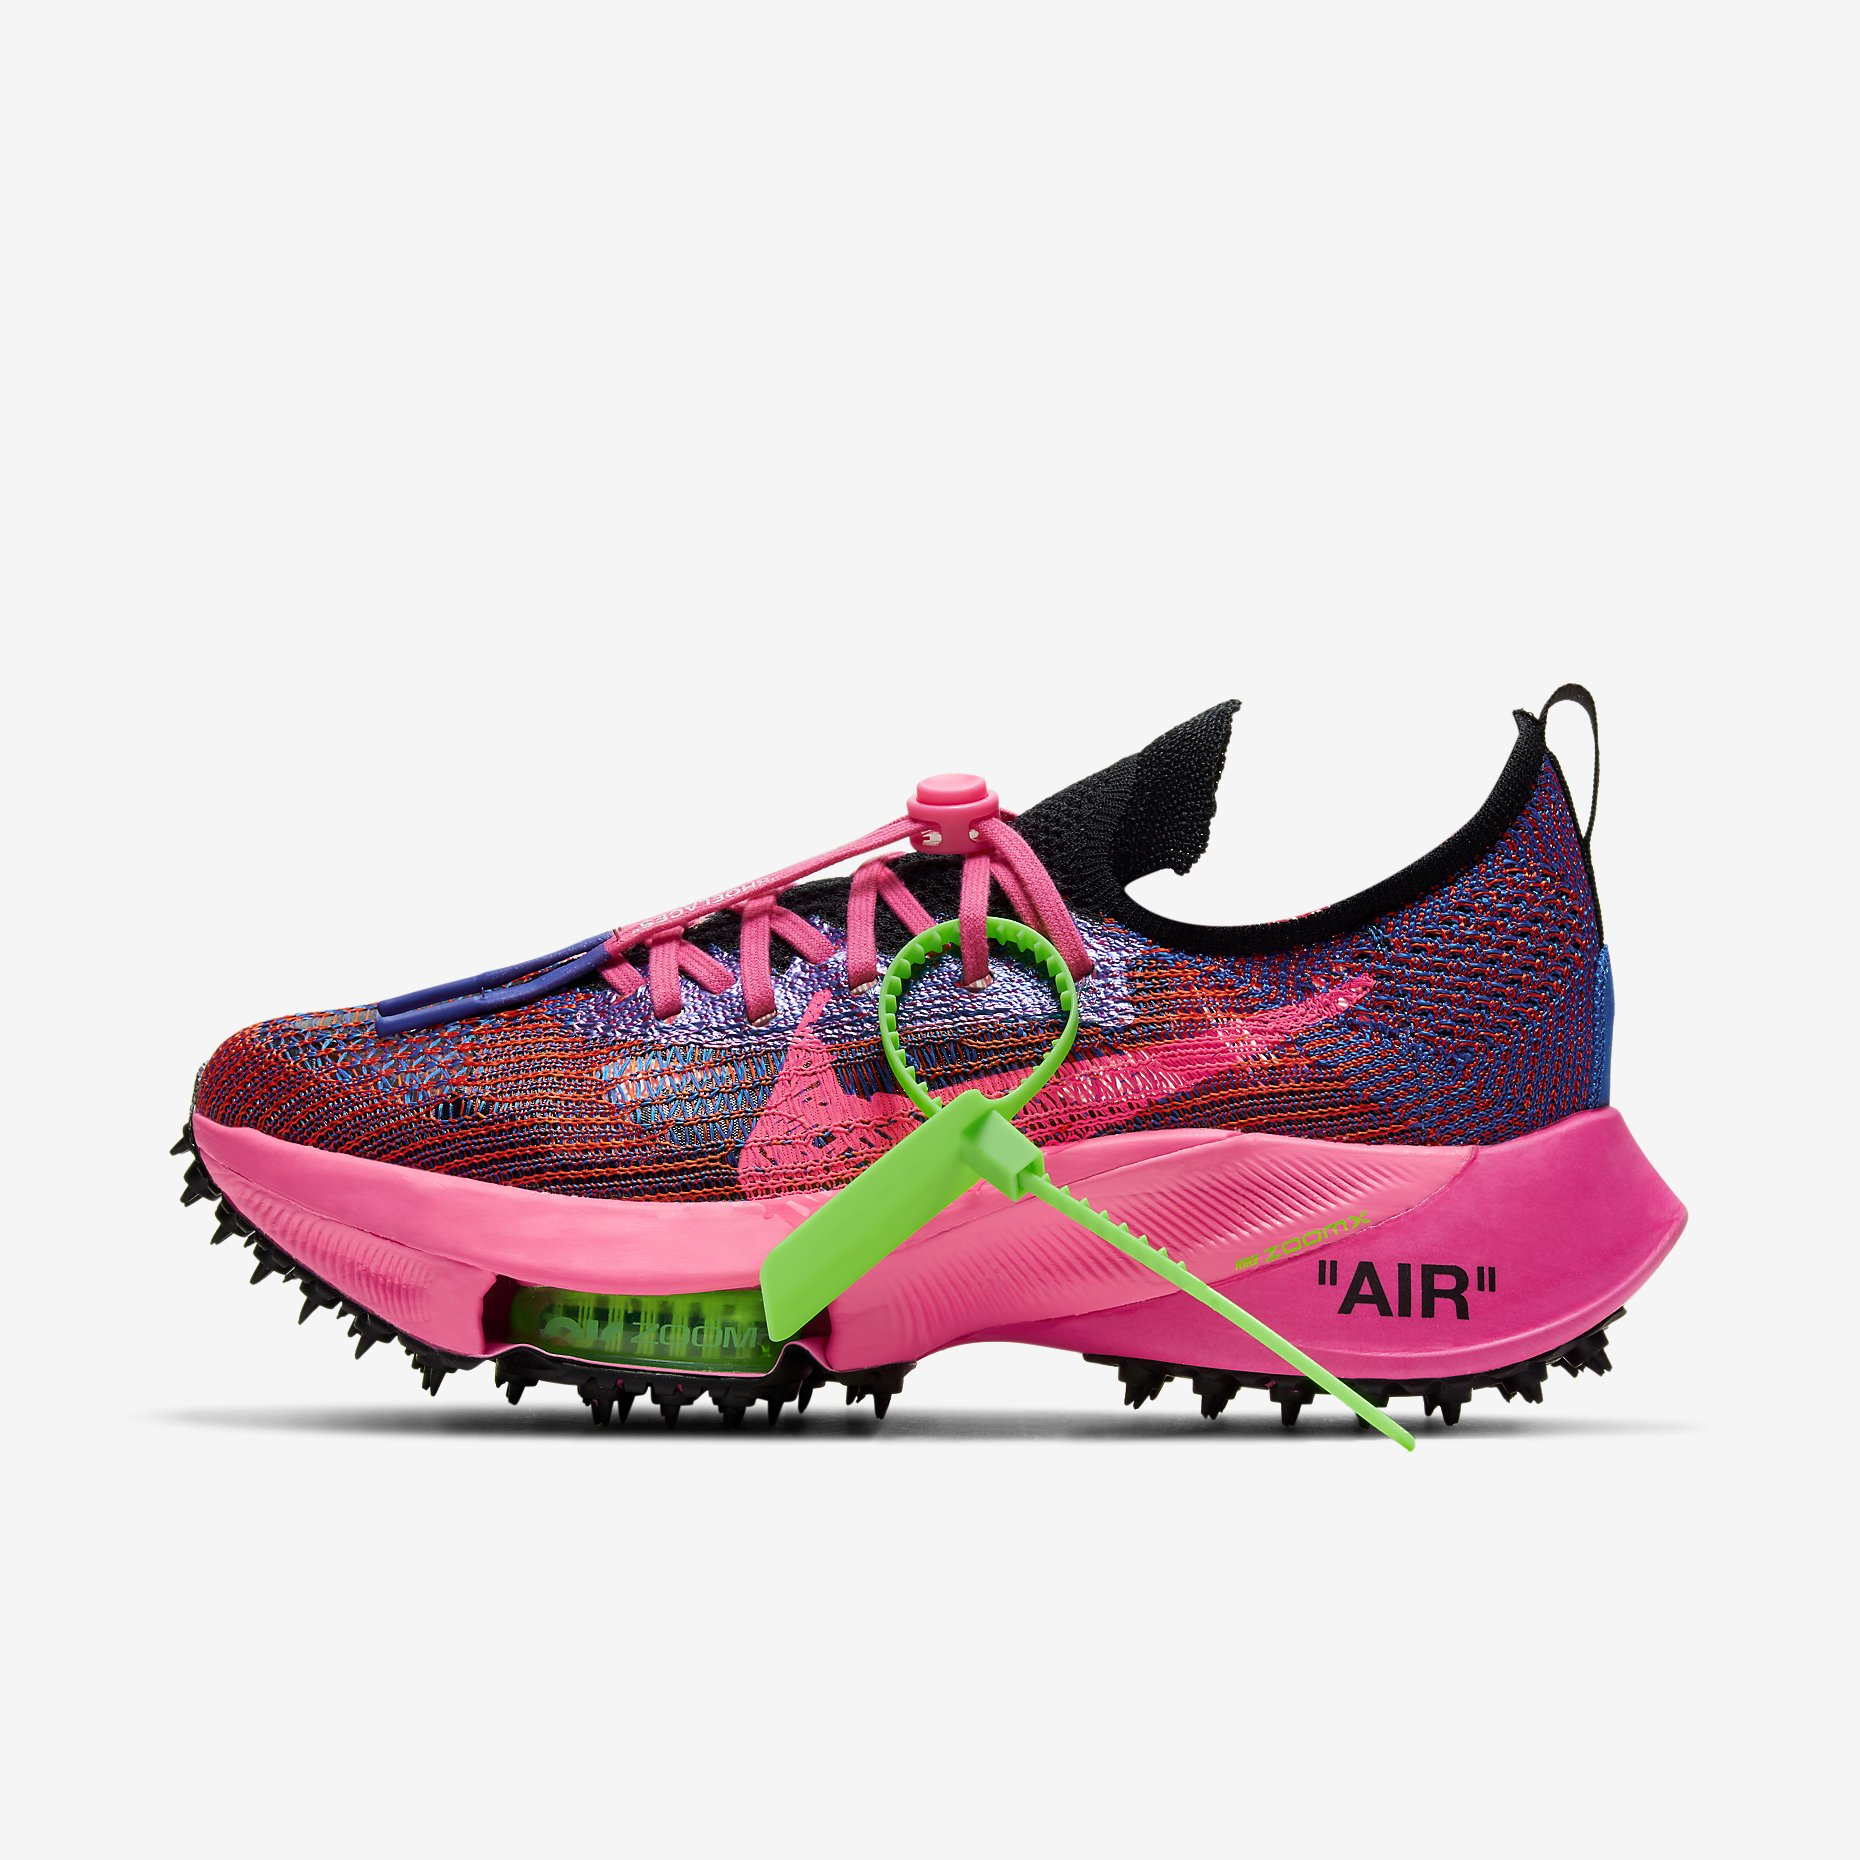 Off-White x Nike Air Zoom Tempo NEXT% 'Pink Glow'